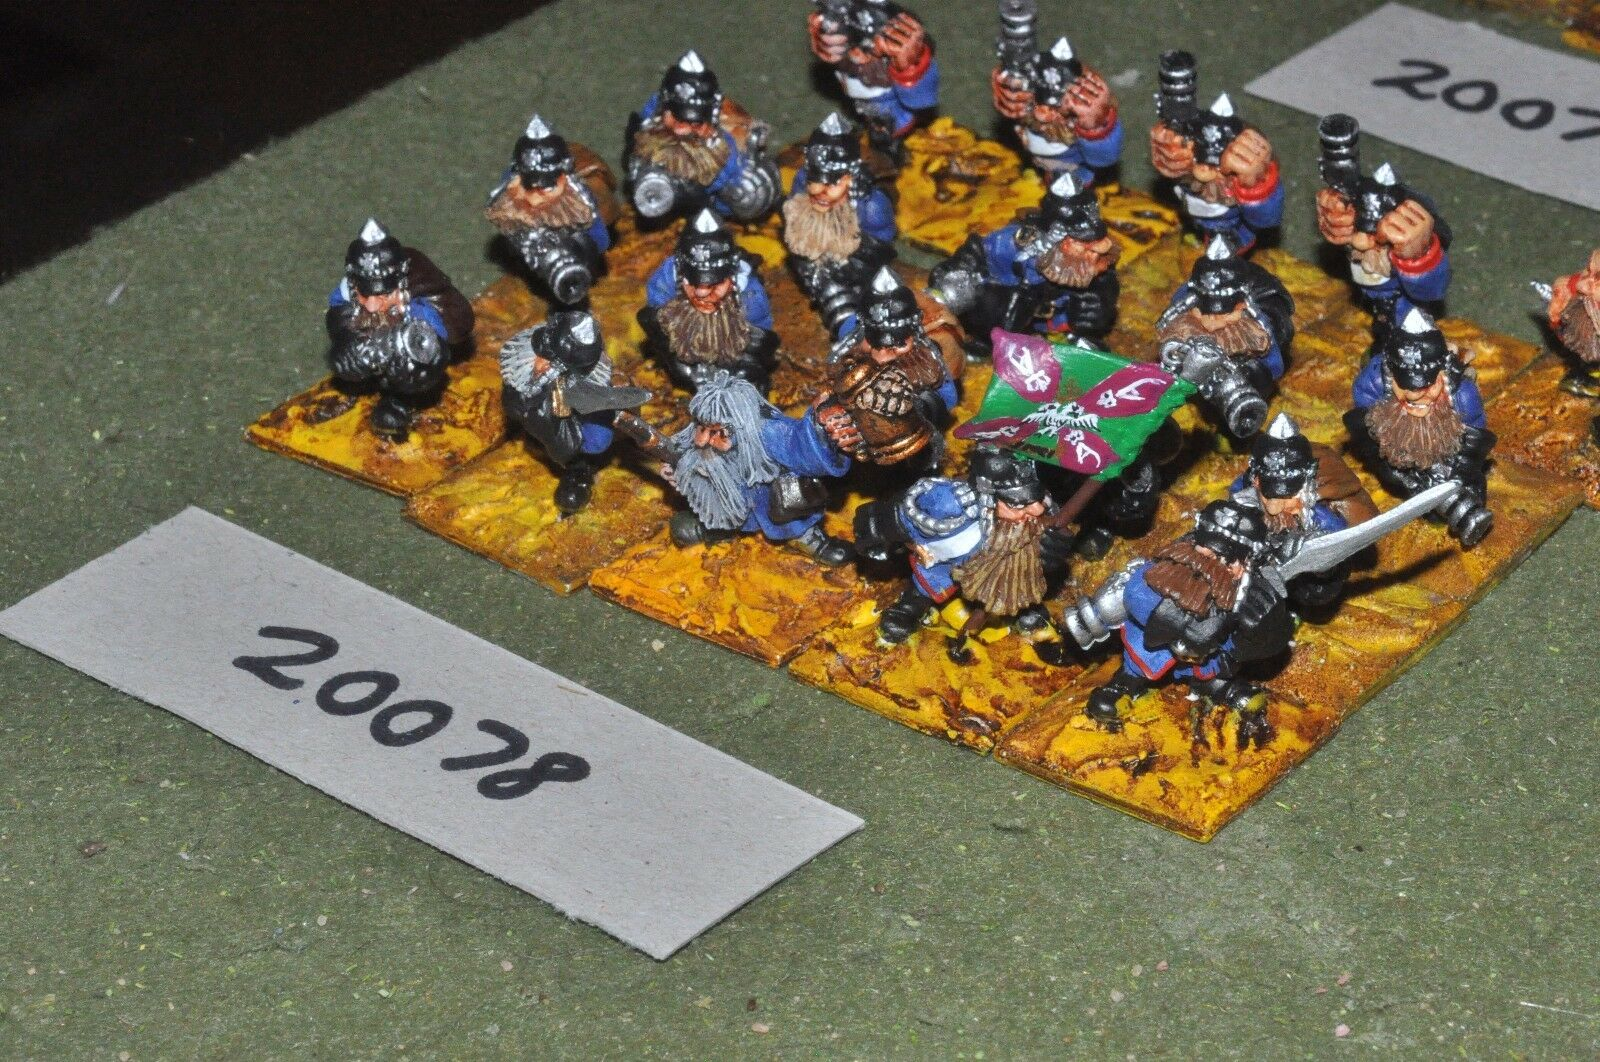 28mm flintloque fantasy dwarf infantry 20 figures {16} (20078)